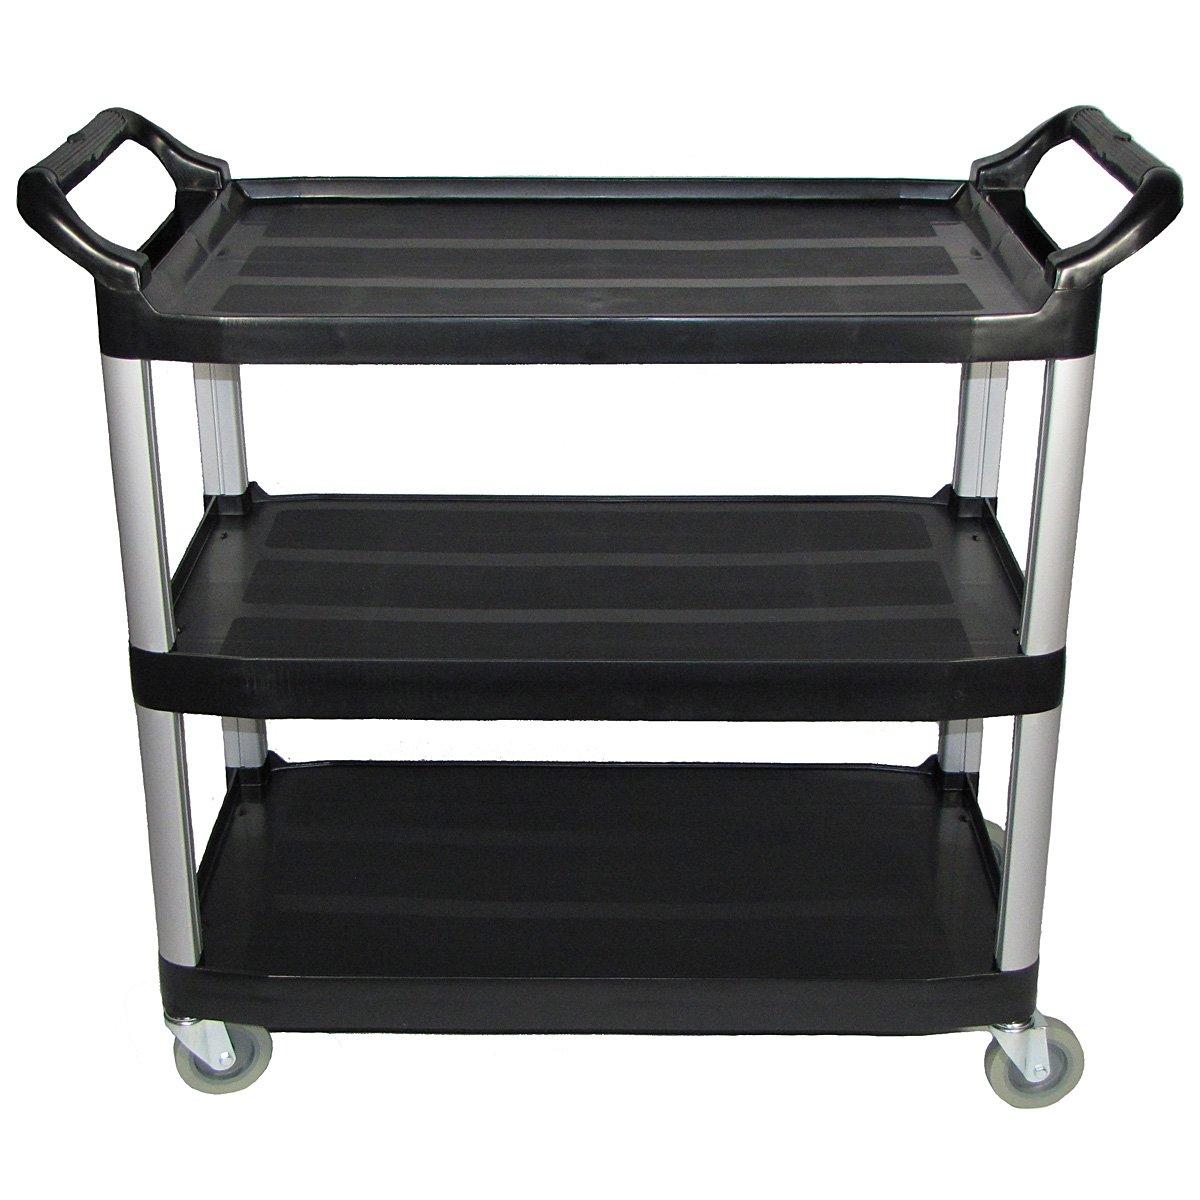 Crayata 3 Shelf Rolling Utility Cart with Heavy Duty Plastic Shelves and Custom Oversized 4 Inch Wheels, 400 Pound Weight Capacity, Black (Large) by Crayata